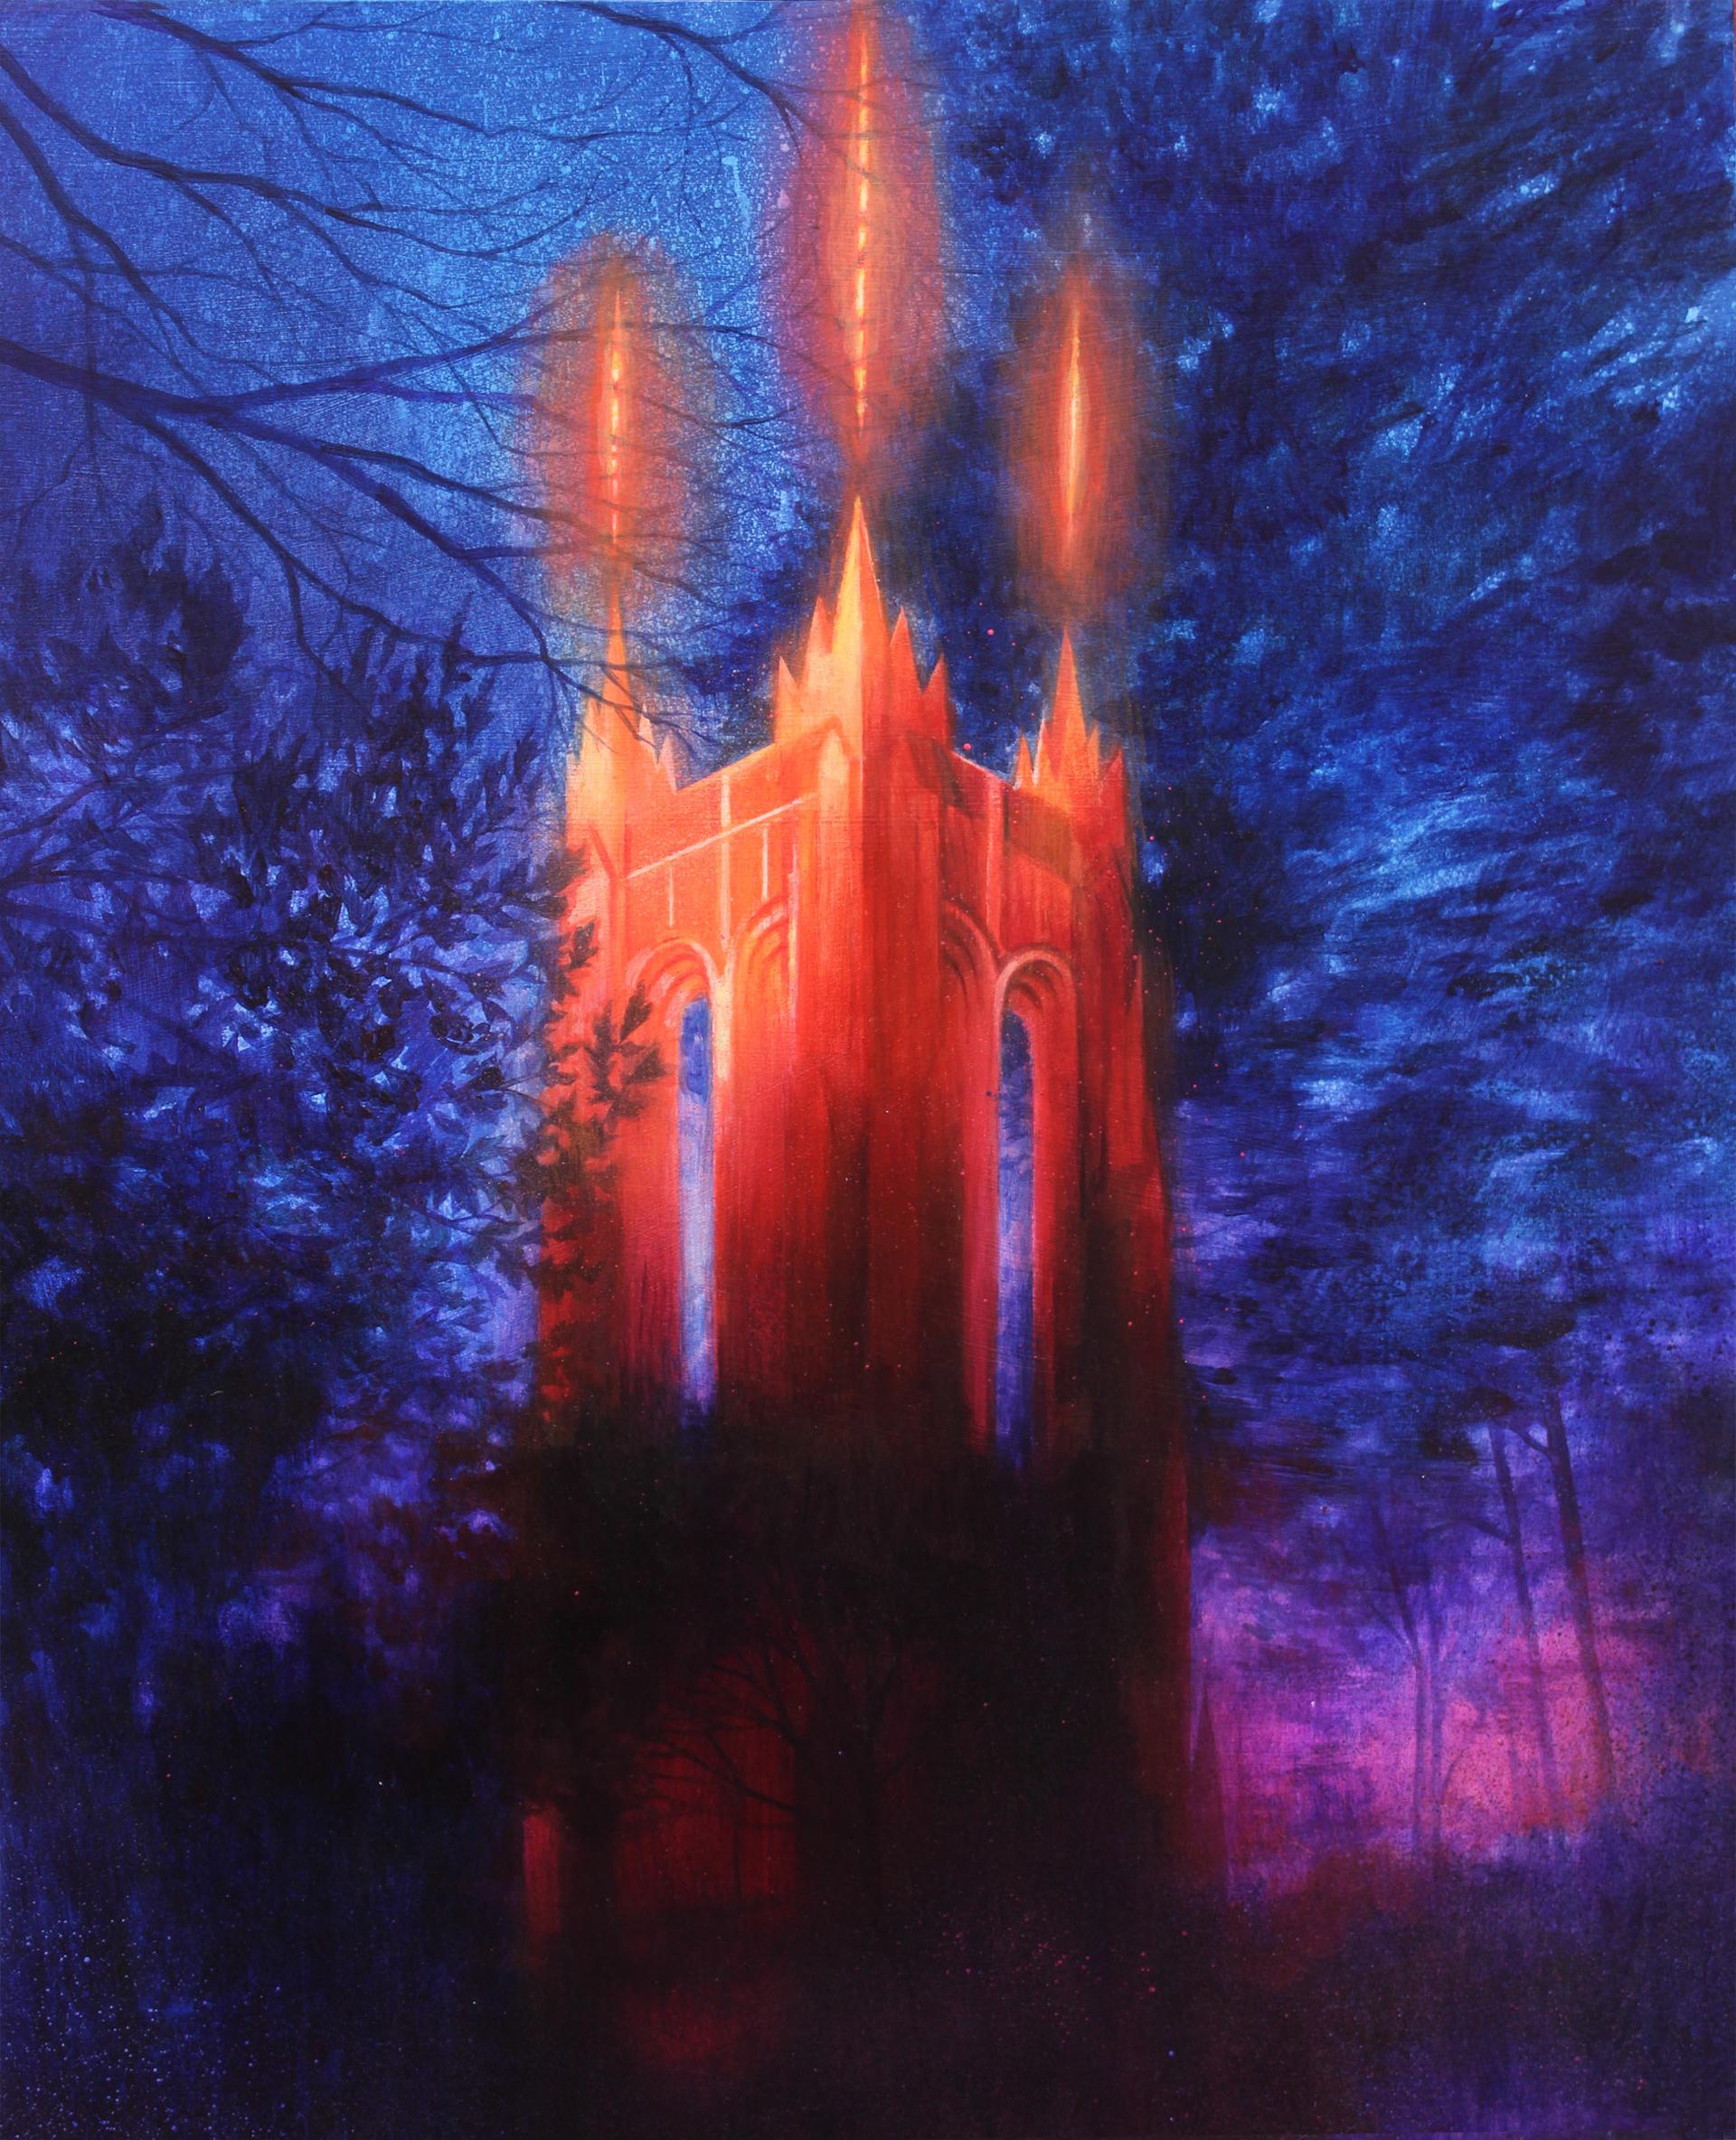 Night Veil by Eli McMullen